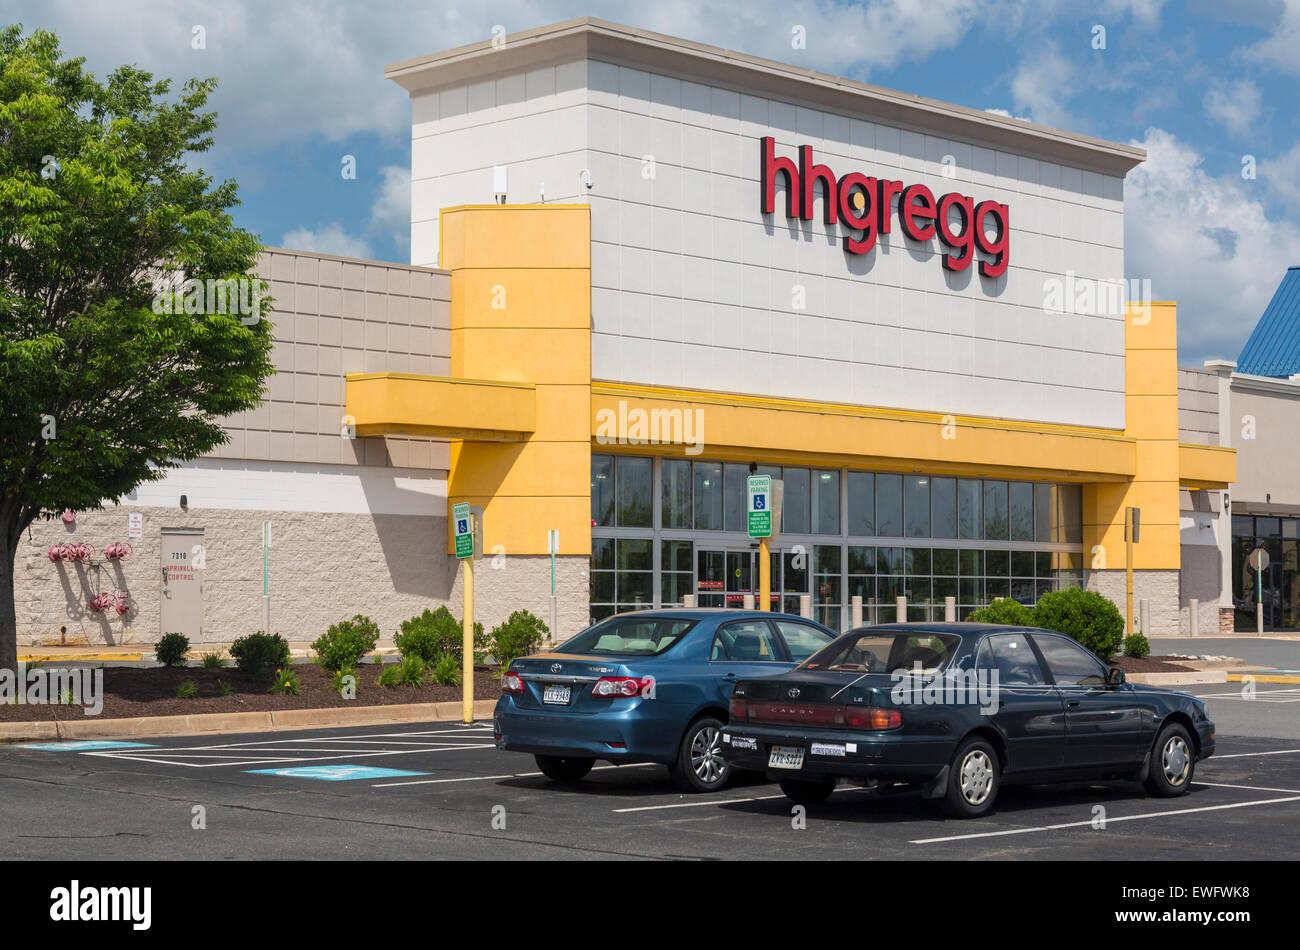 hhgregg electrical superstore in Manassas, Virginia, USA - Stock Image